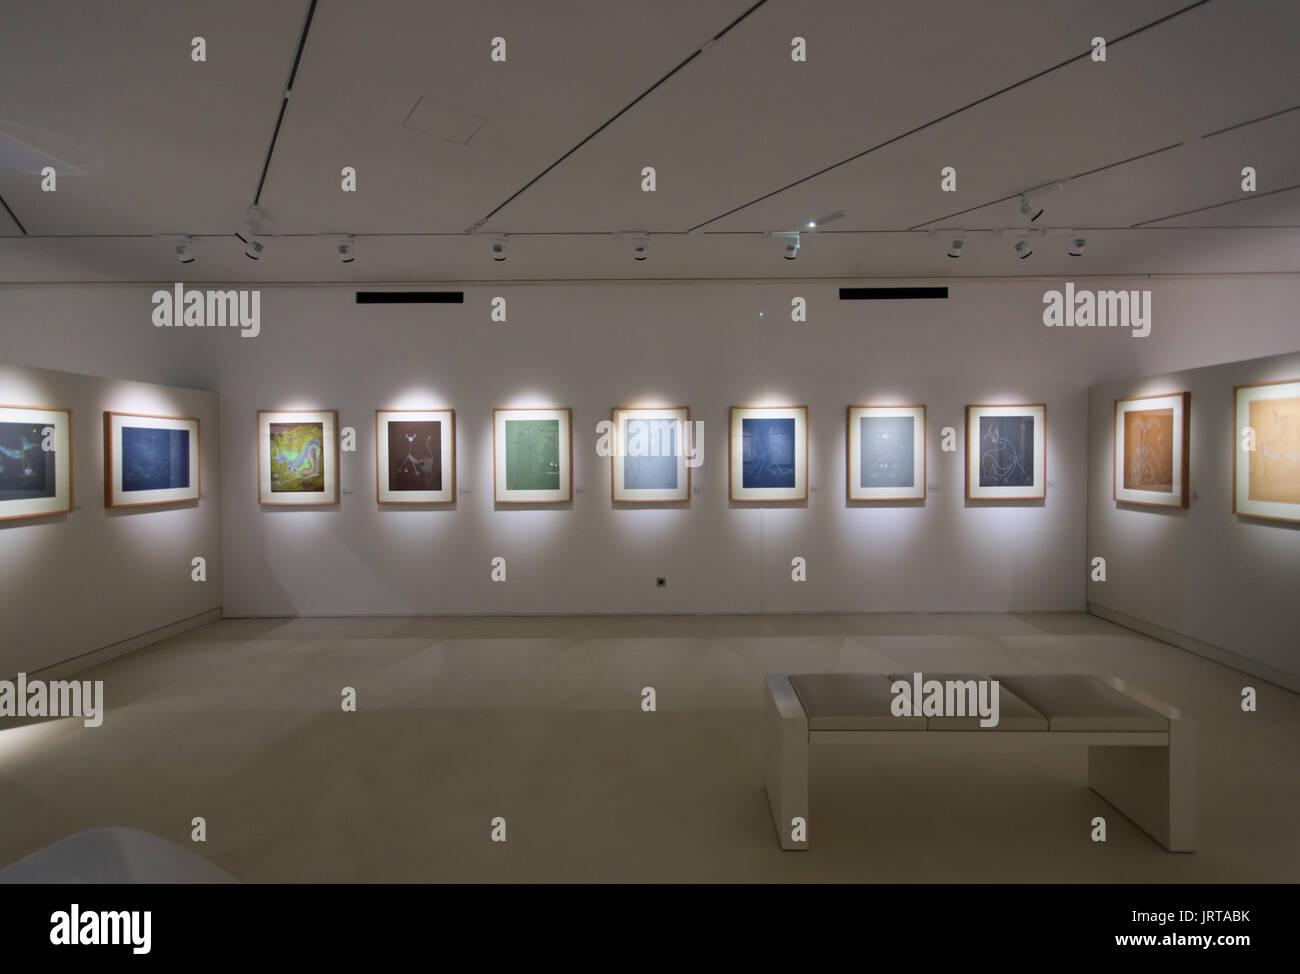 Jean Cocteau Museum, Menton, French Riviera: architect Rudy Ricciotti interior permanent exhibition Séverin Wunderman Collection  1 Inexhibit - Stock Image